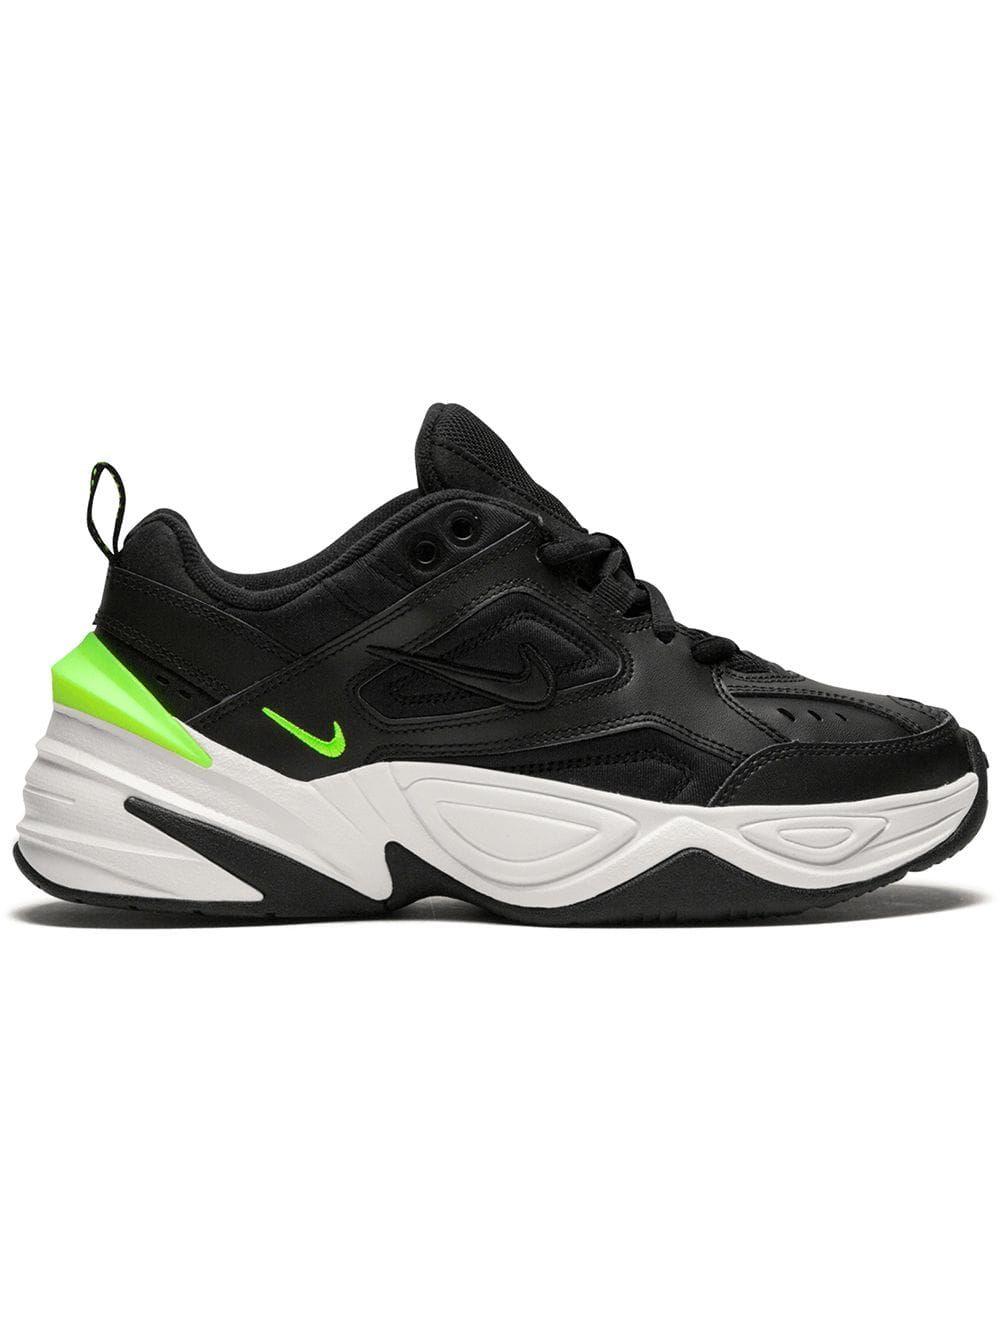 Nike M2K Tekno Sneakers | Zapatillas, Zapatos, Zapatos ...